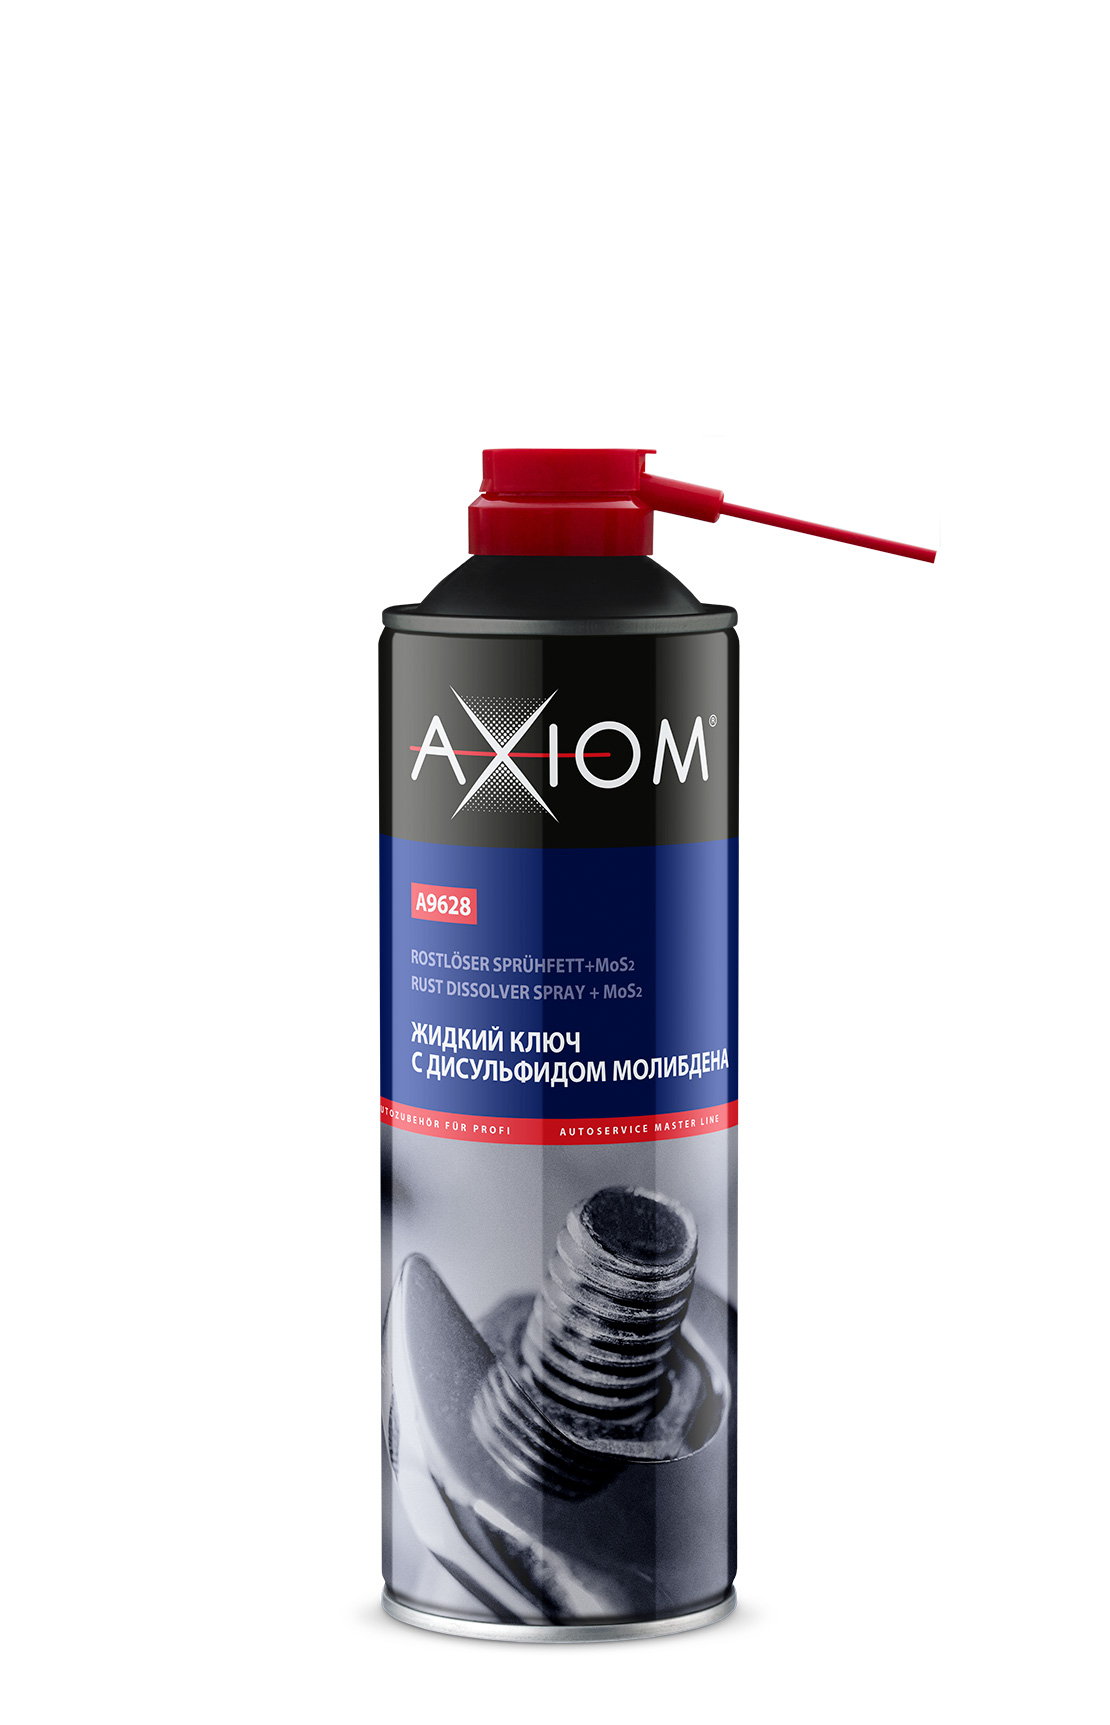 A9628 Жидкий ключ с дисульфидом молибдена AXIOM